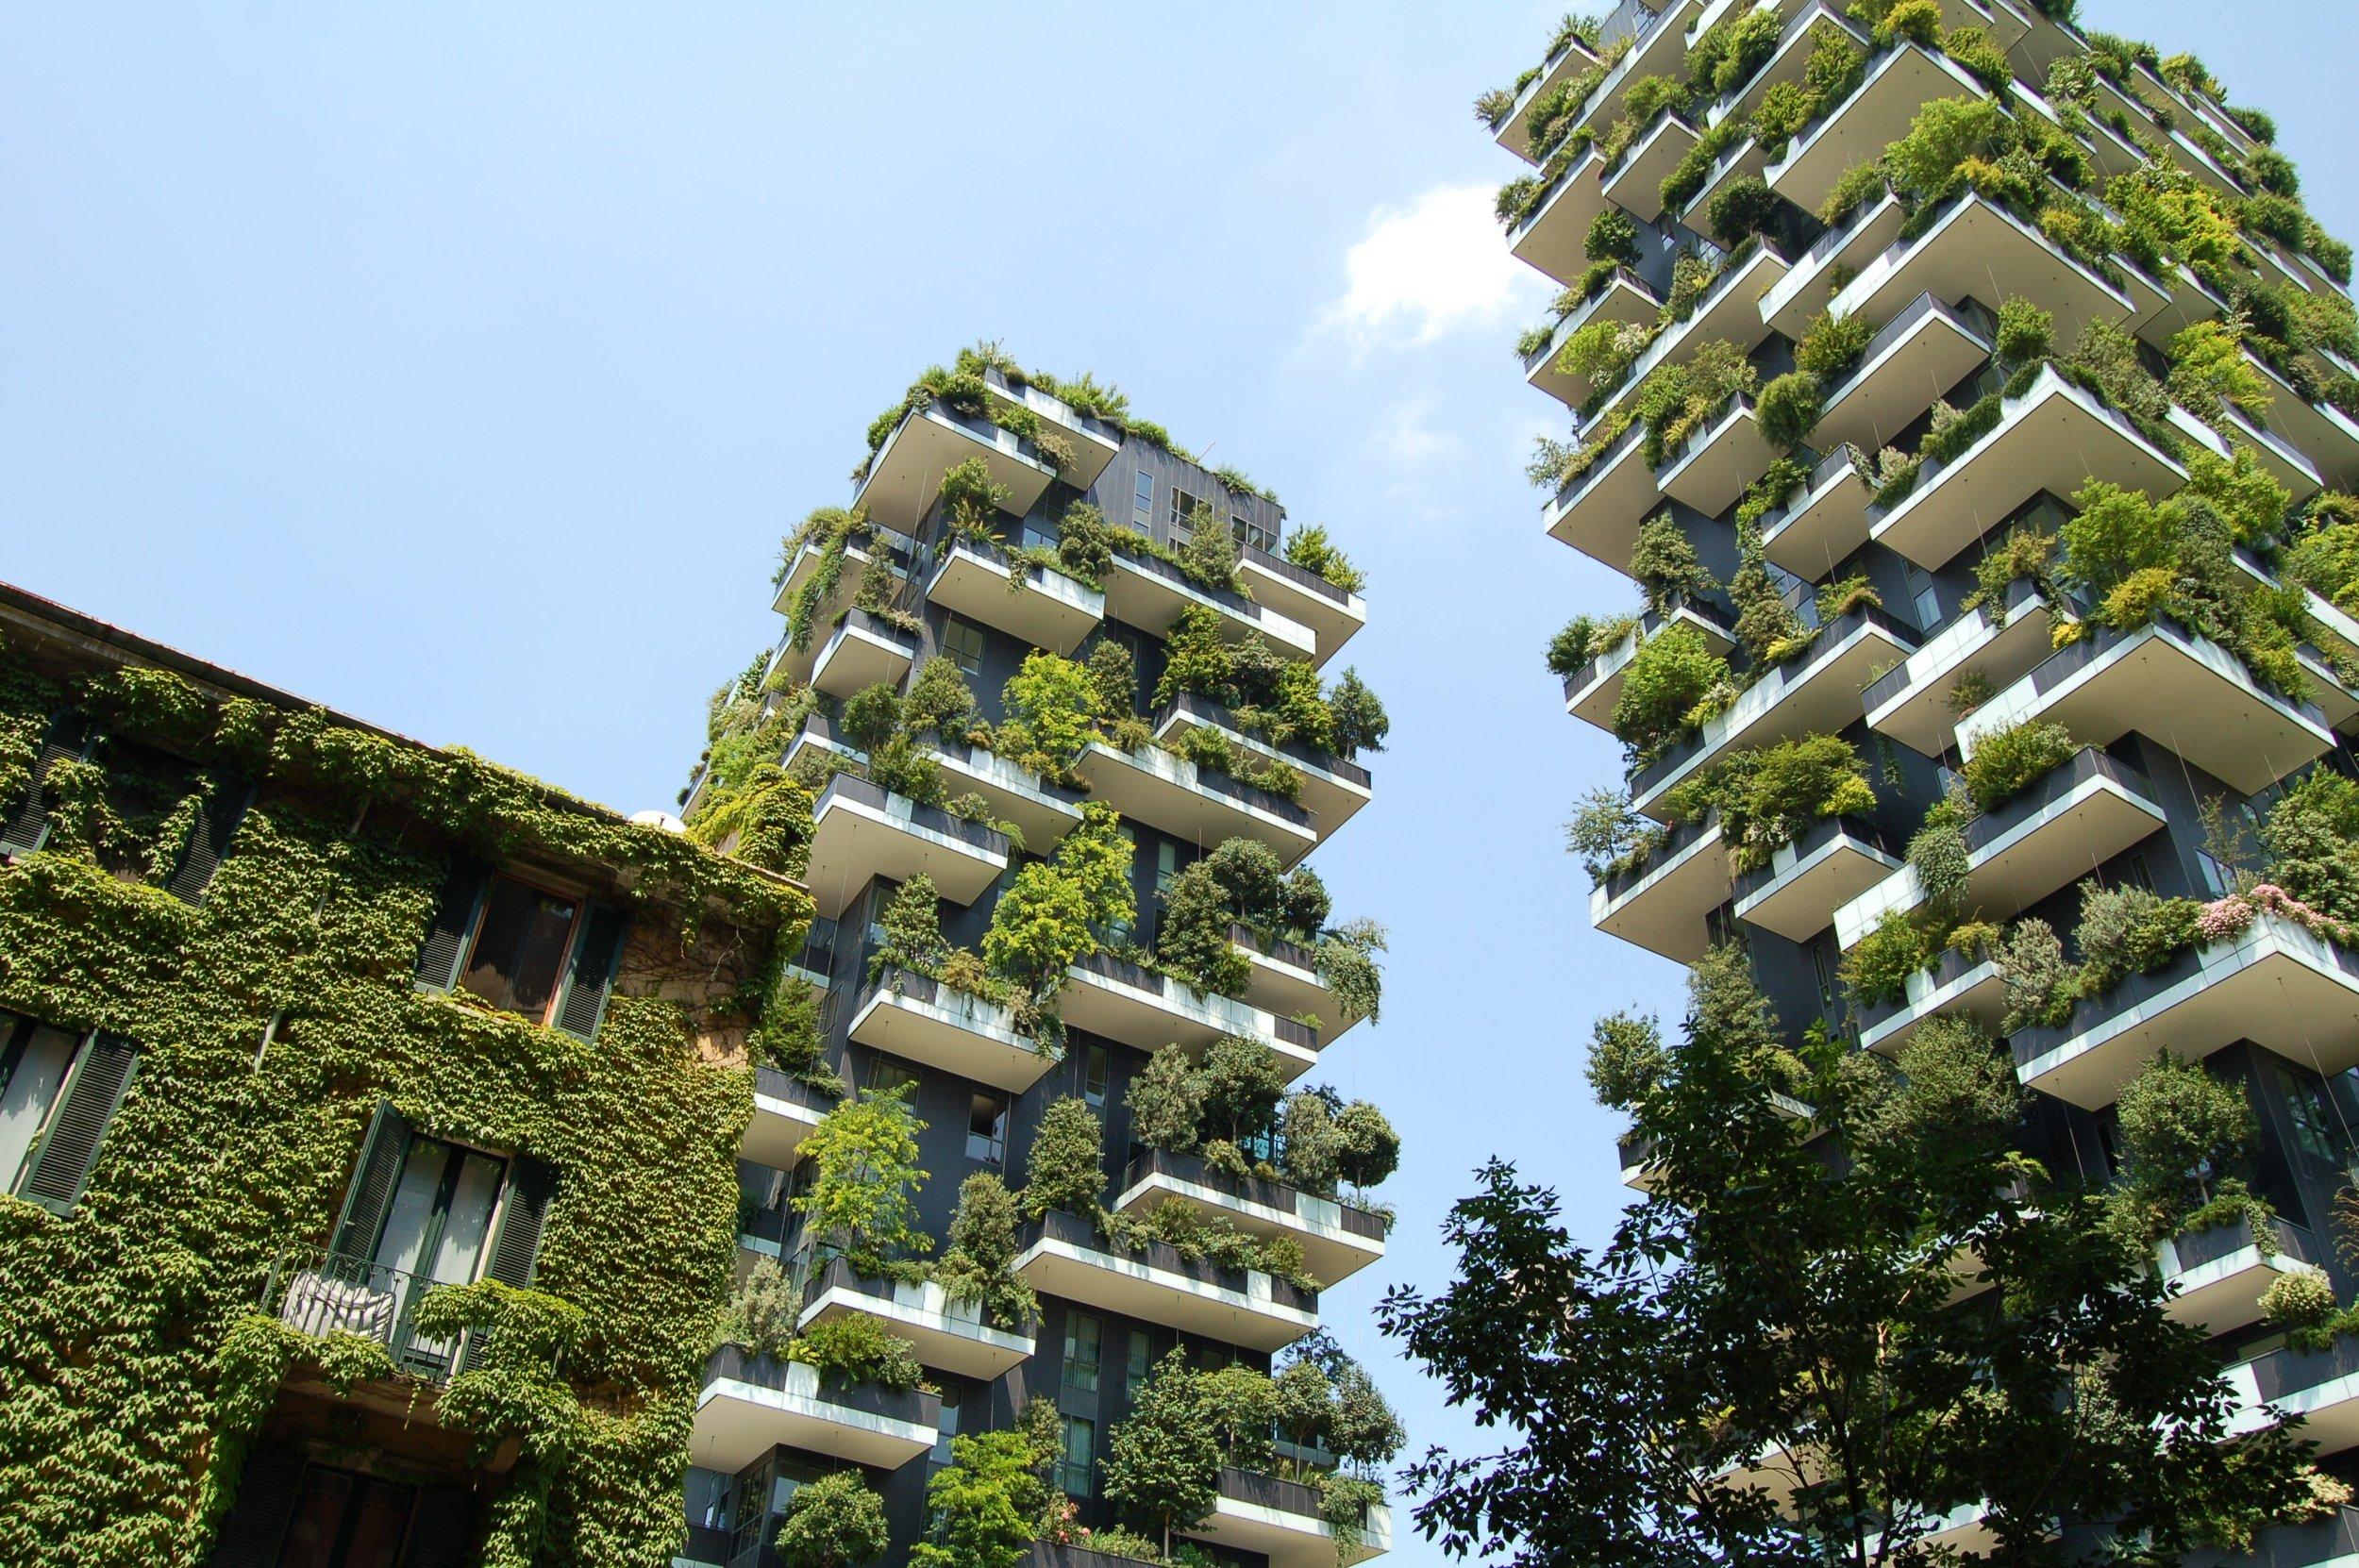 Vertical gardening in Milan, Italy.